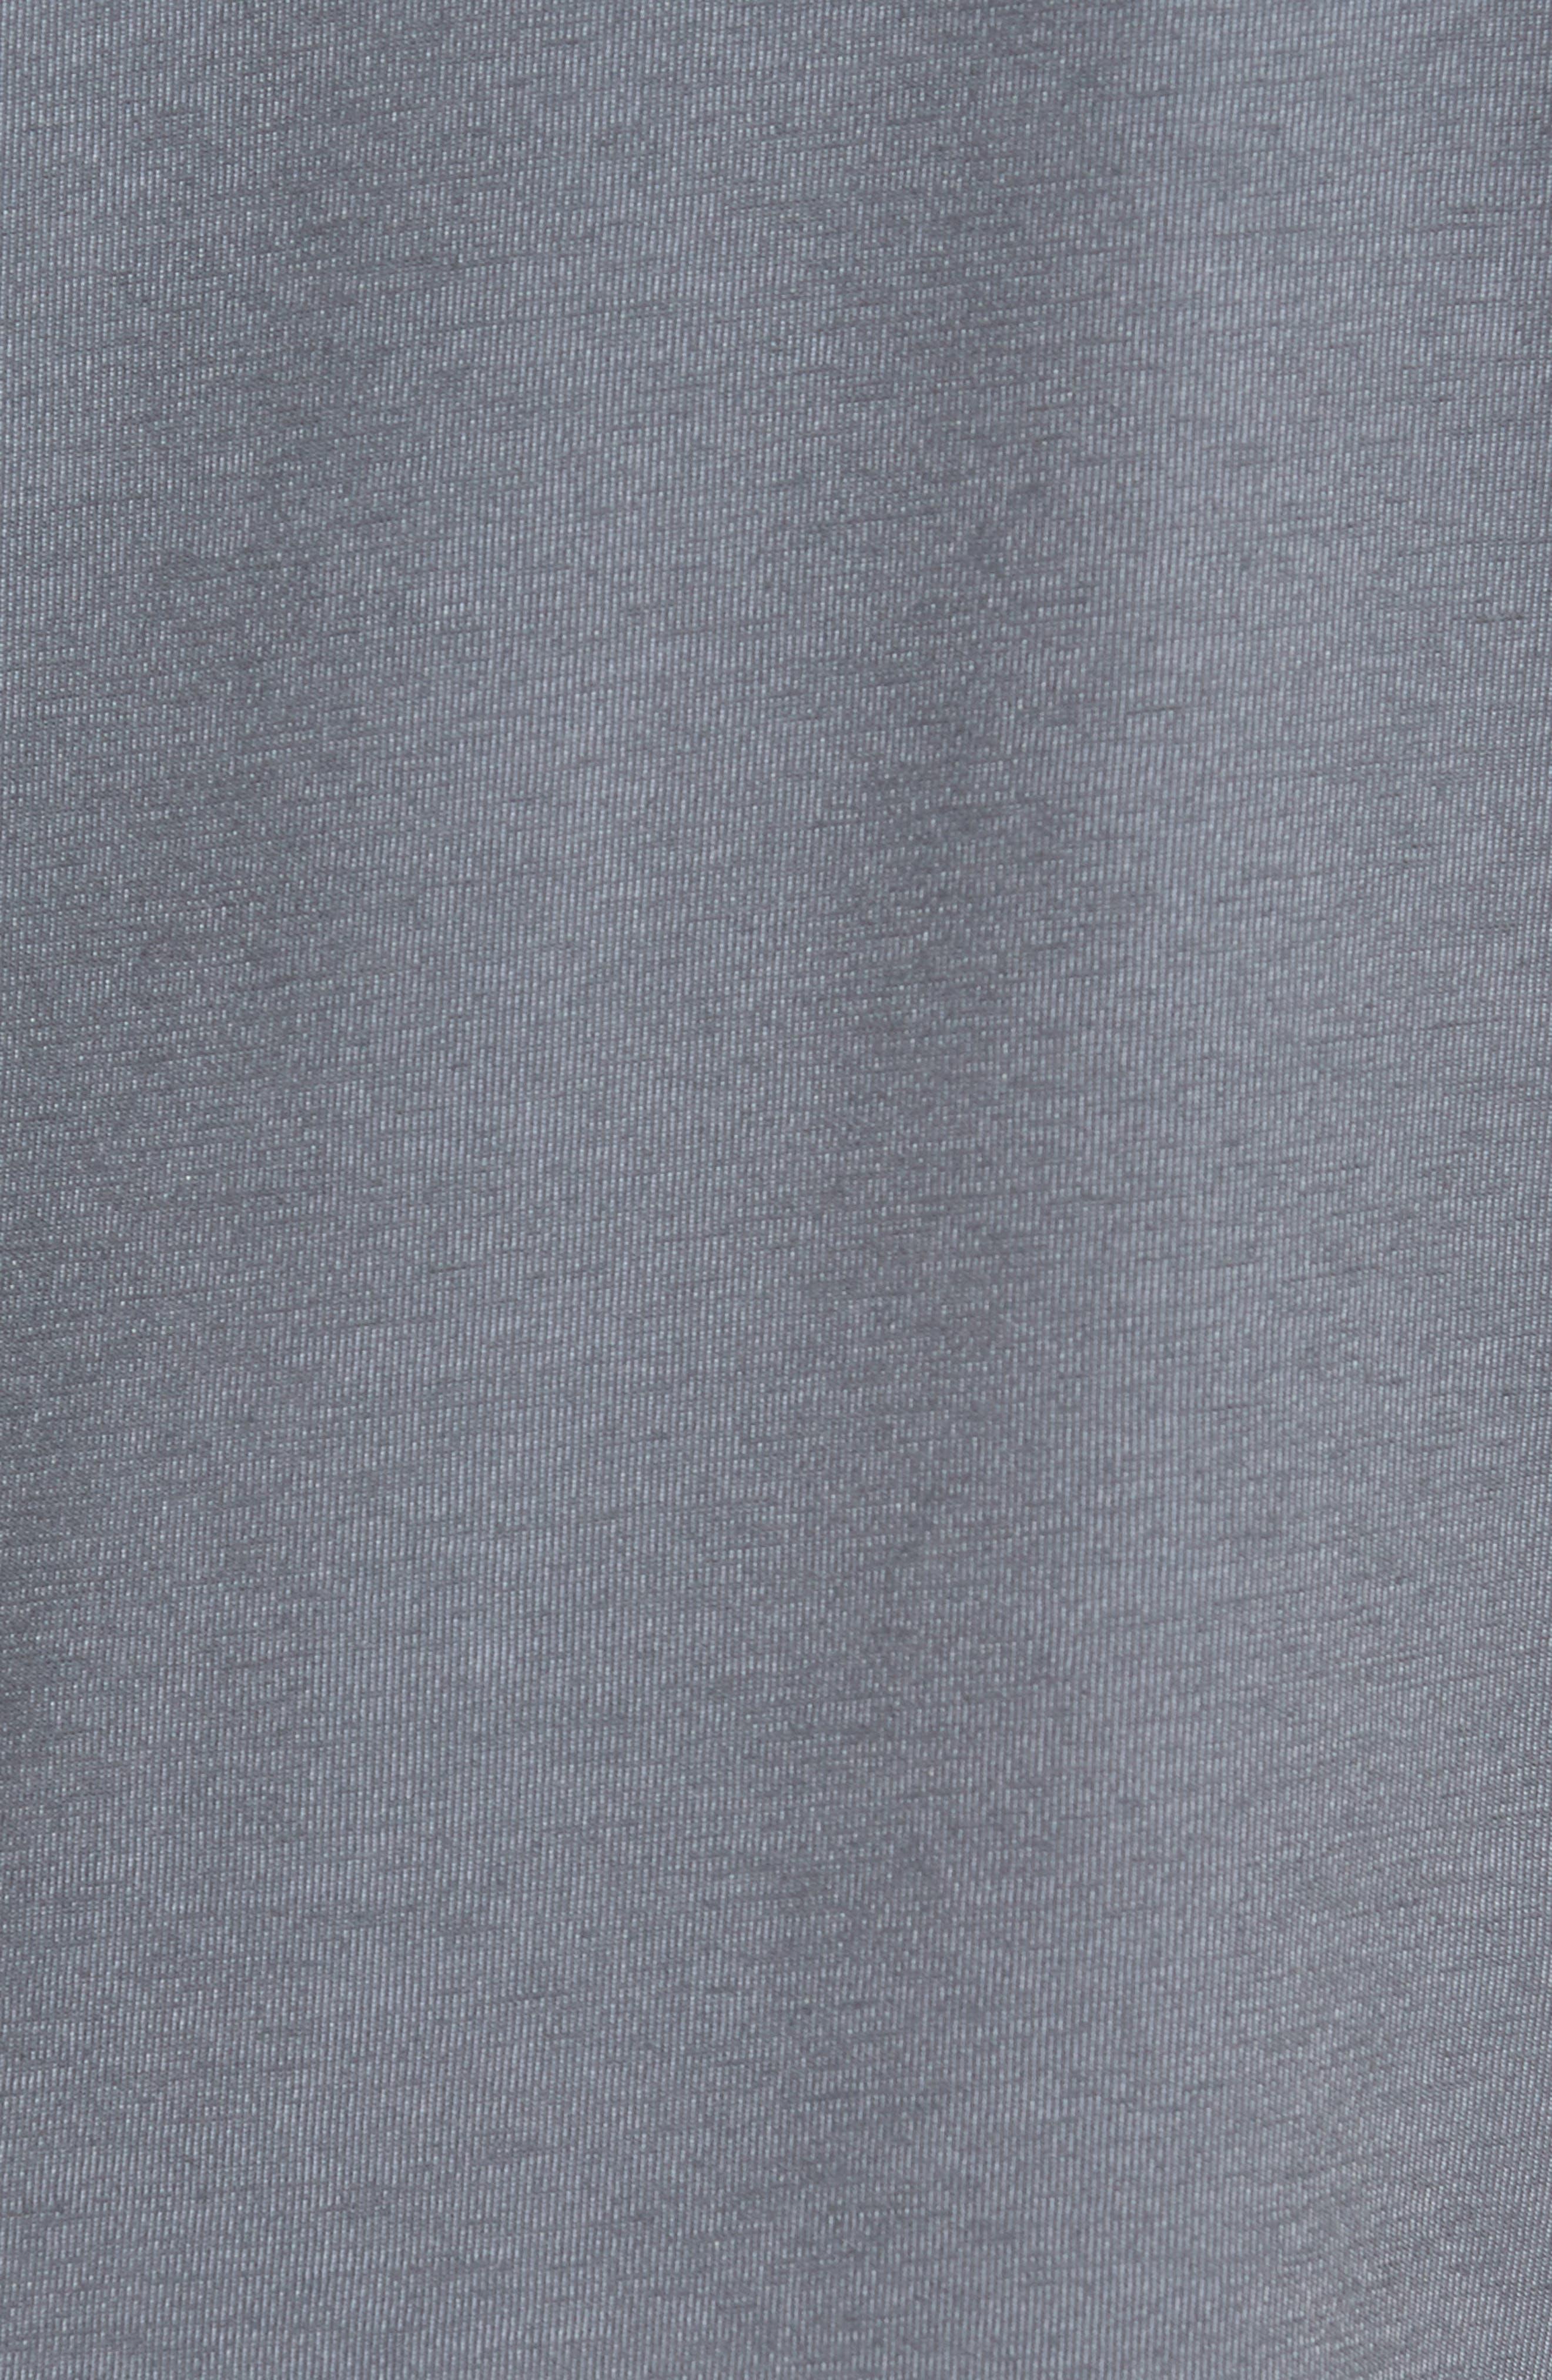 Knit Polo,                             Alternate thumbnail 5, color,                             020